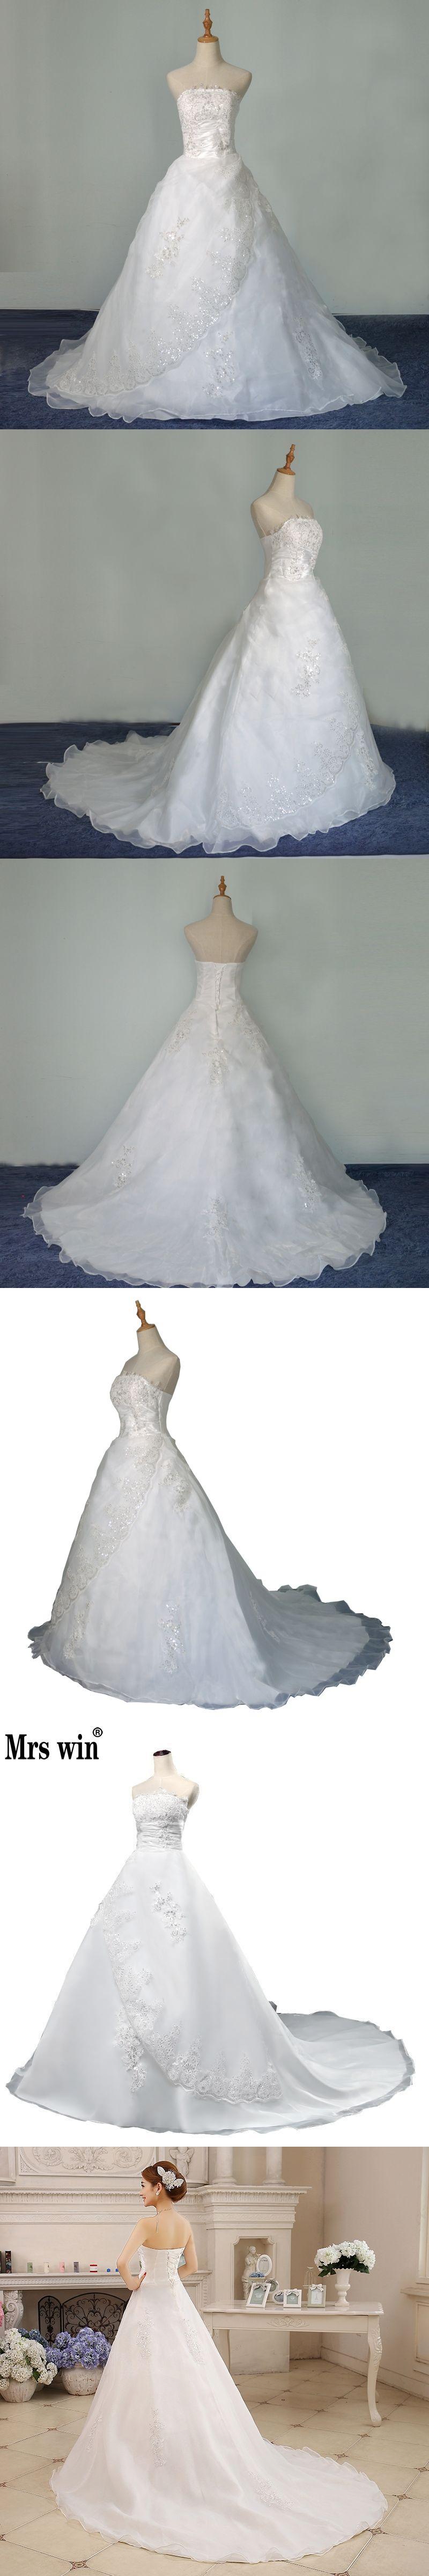 7695274ed19d New Summer Style Wedding Bride Long Tail Bra Straps Lace Wedding Dress  Vestidos De Casamento Bridal